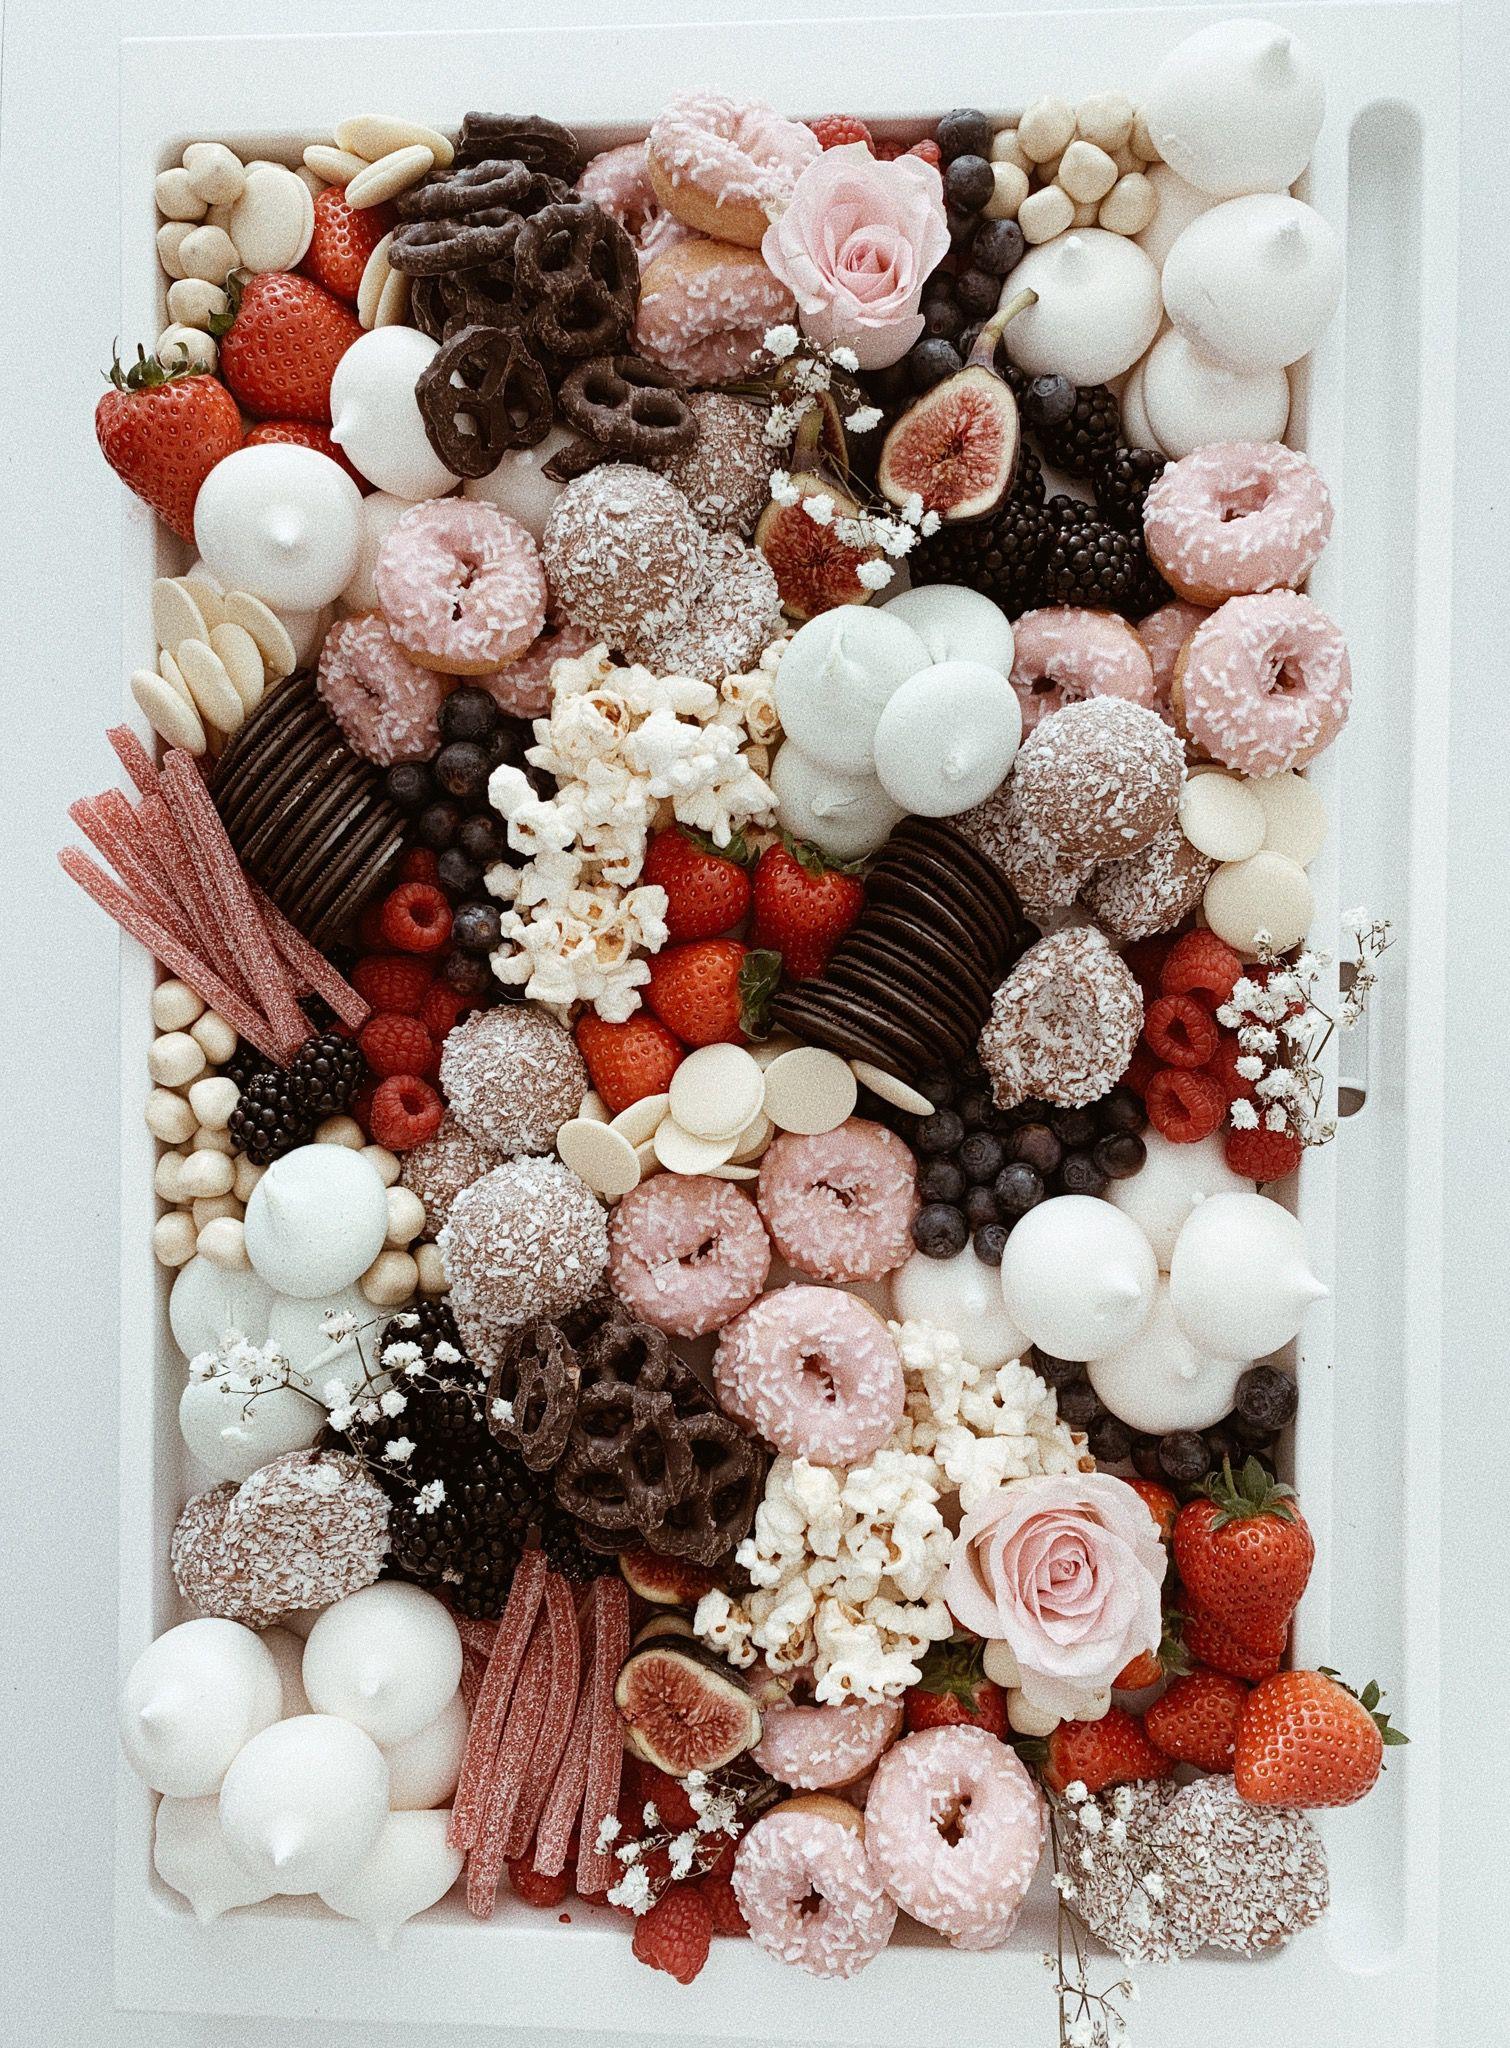 Pastel kids desserts | Party food platters, Kid desserts ...